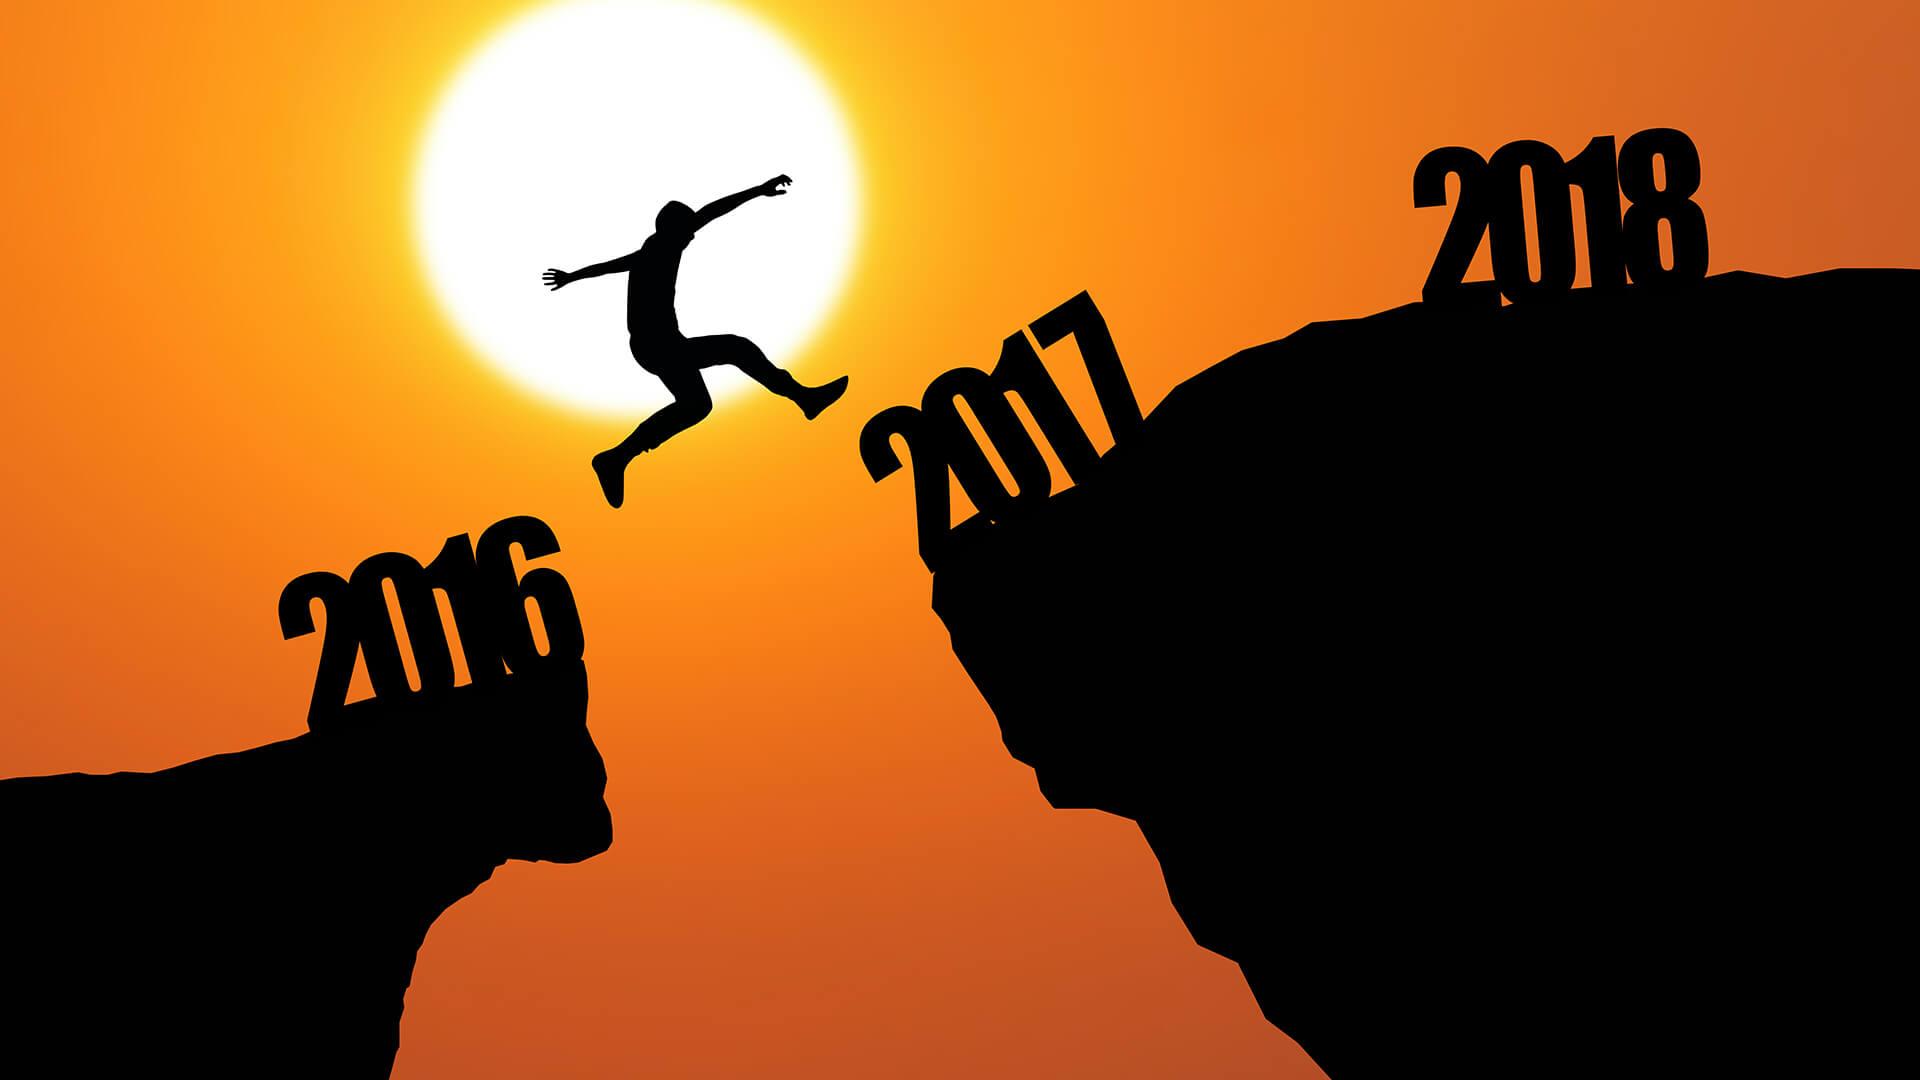 2016-2017-future-ss-1920